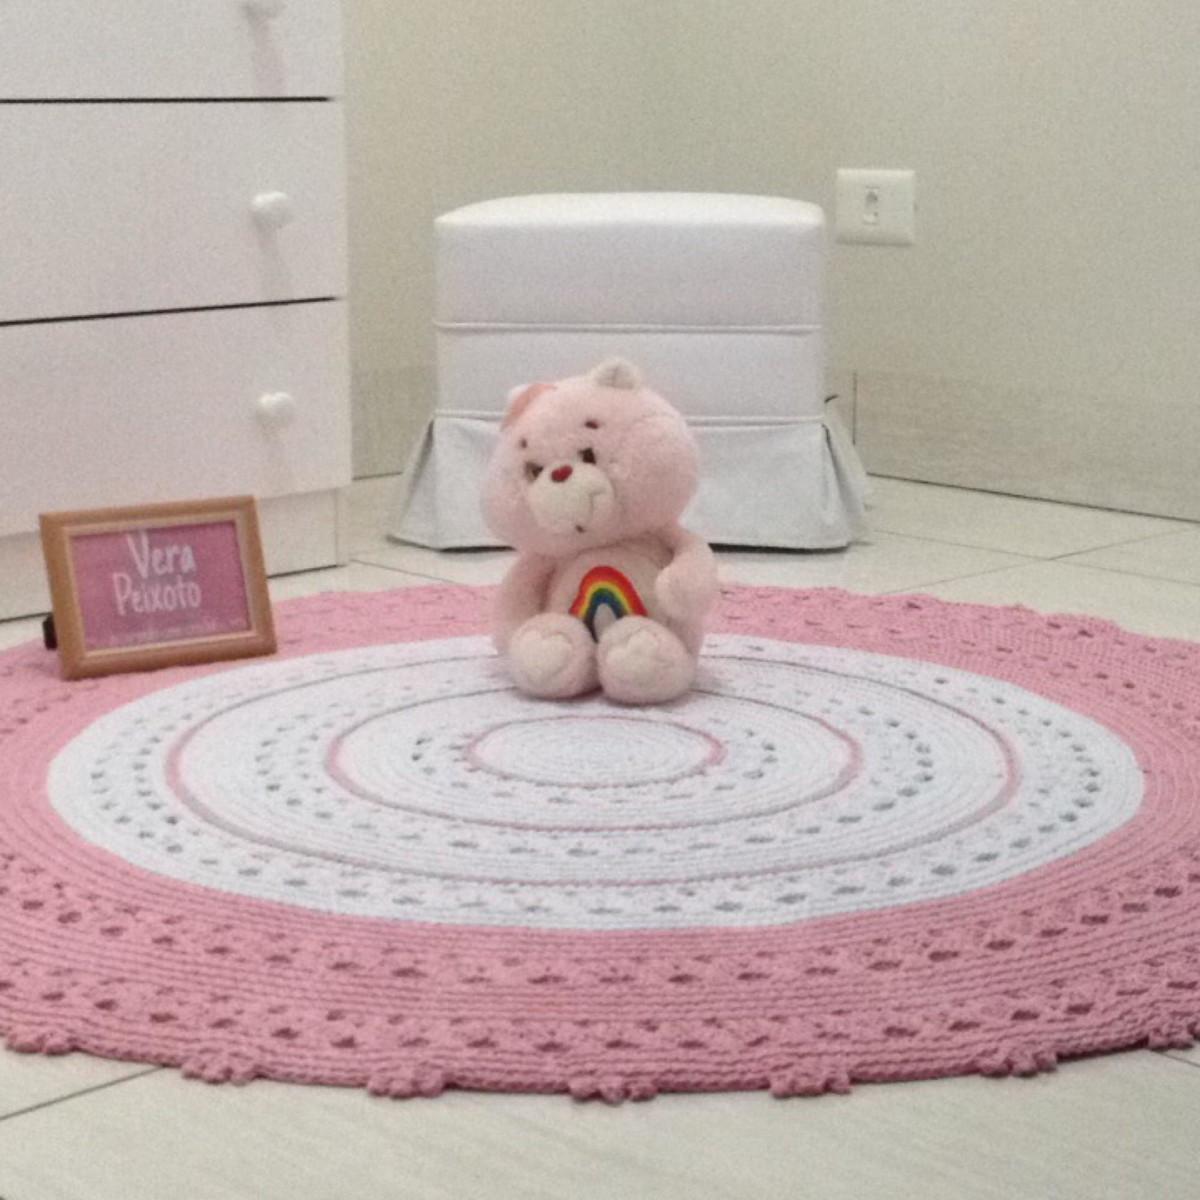 tapete de croch redondo branco e rosa beb nina no elo7 ateli vera peixoto 92505a. Black Bedroom Furniture Sets. Home Design Ideas